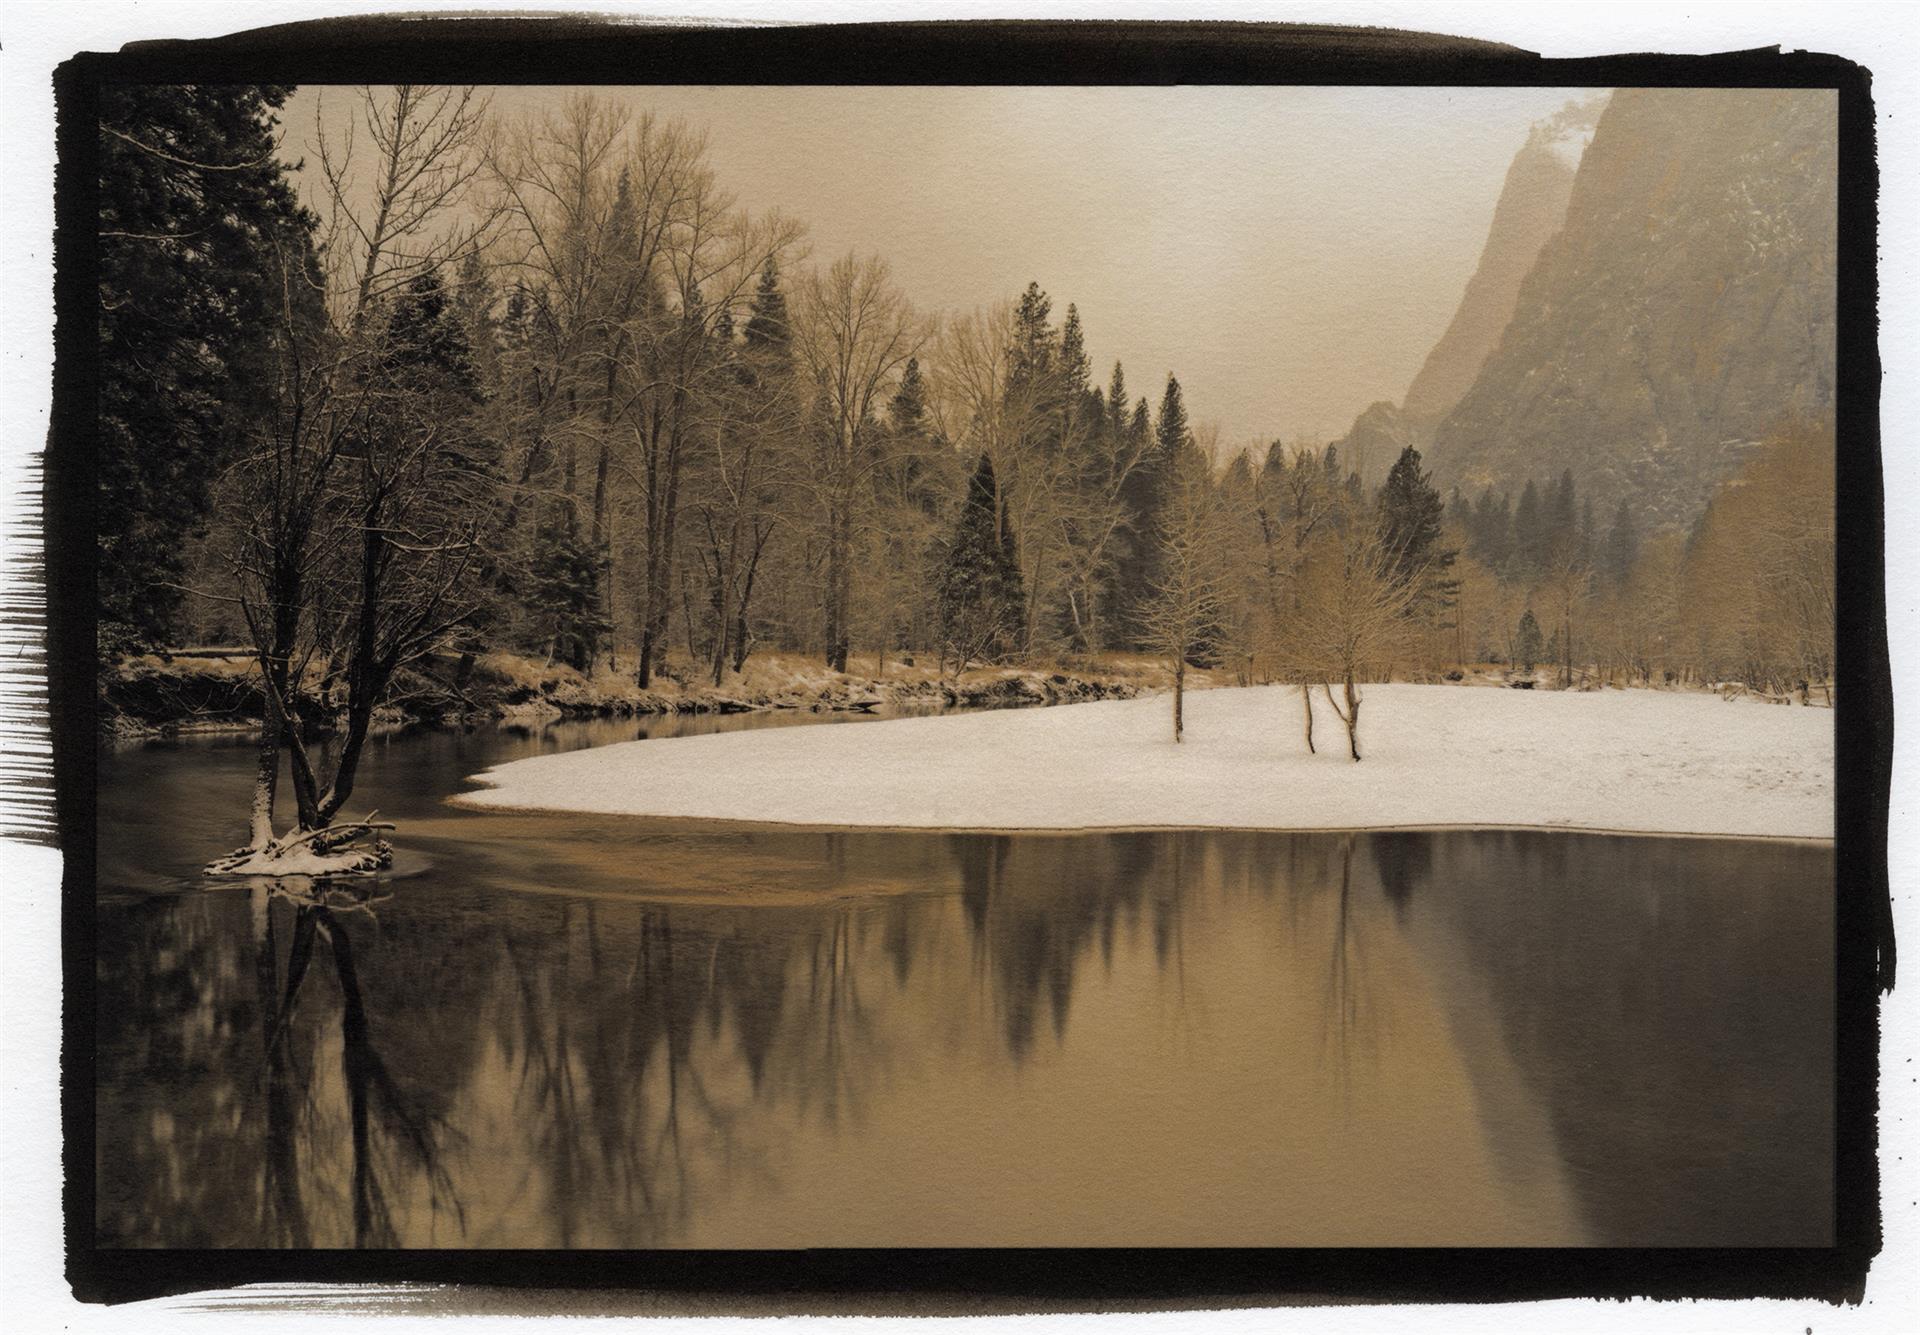 Merced River in Winter, Kerik Kouklis